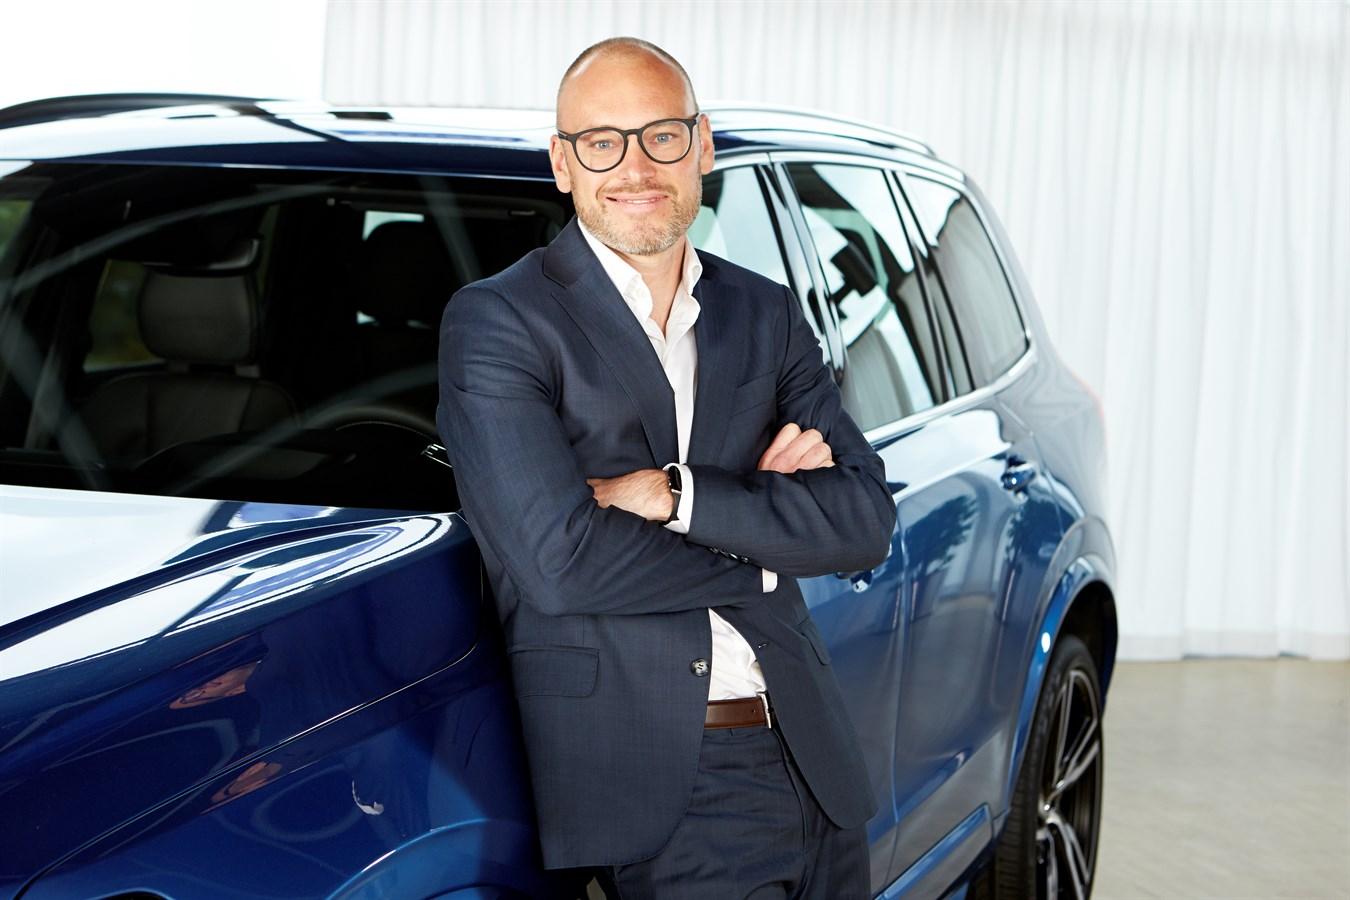 Volvo_Bjoern Annwall